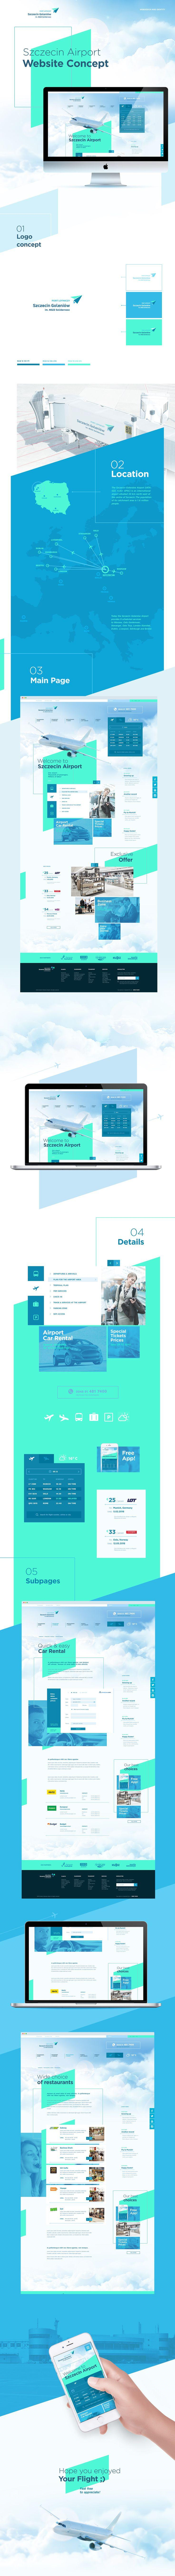 Szczecin Airport | redesign concept on Behance